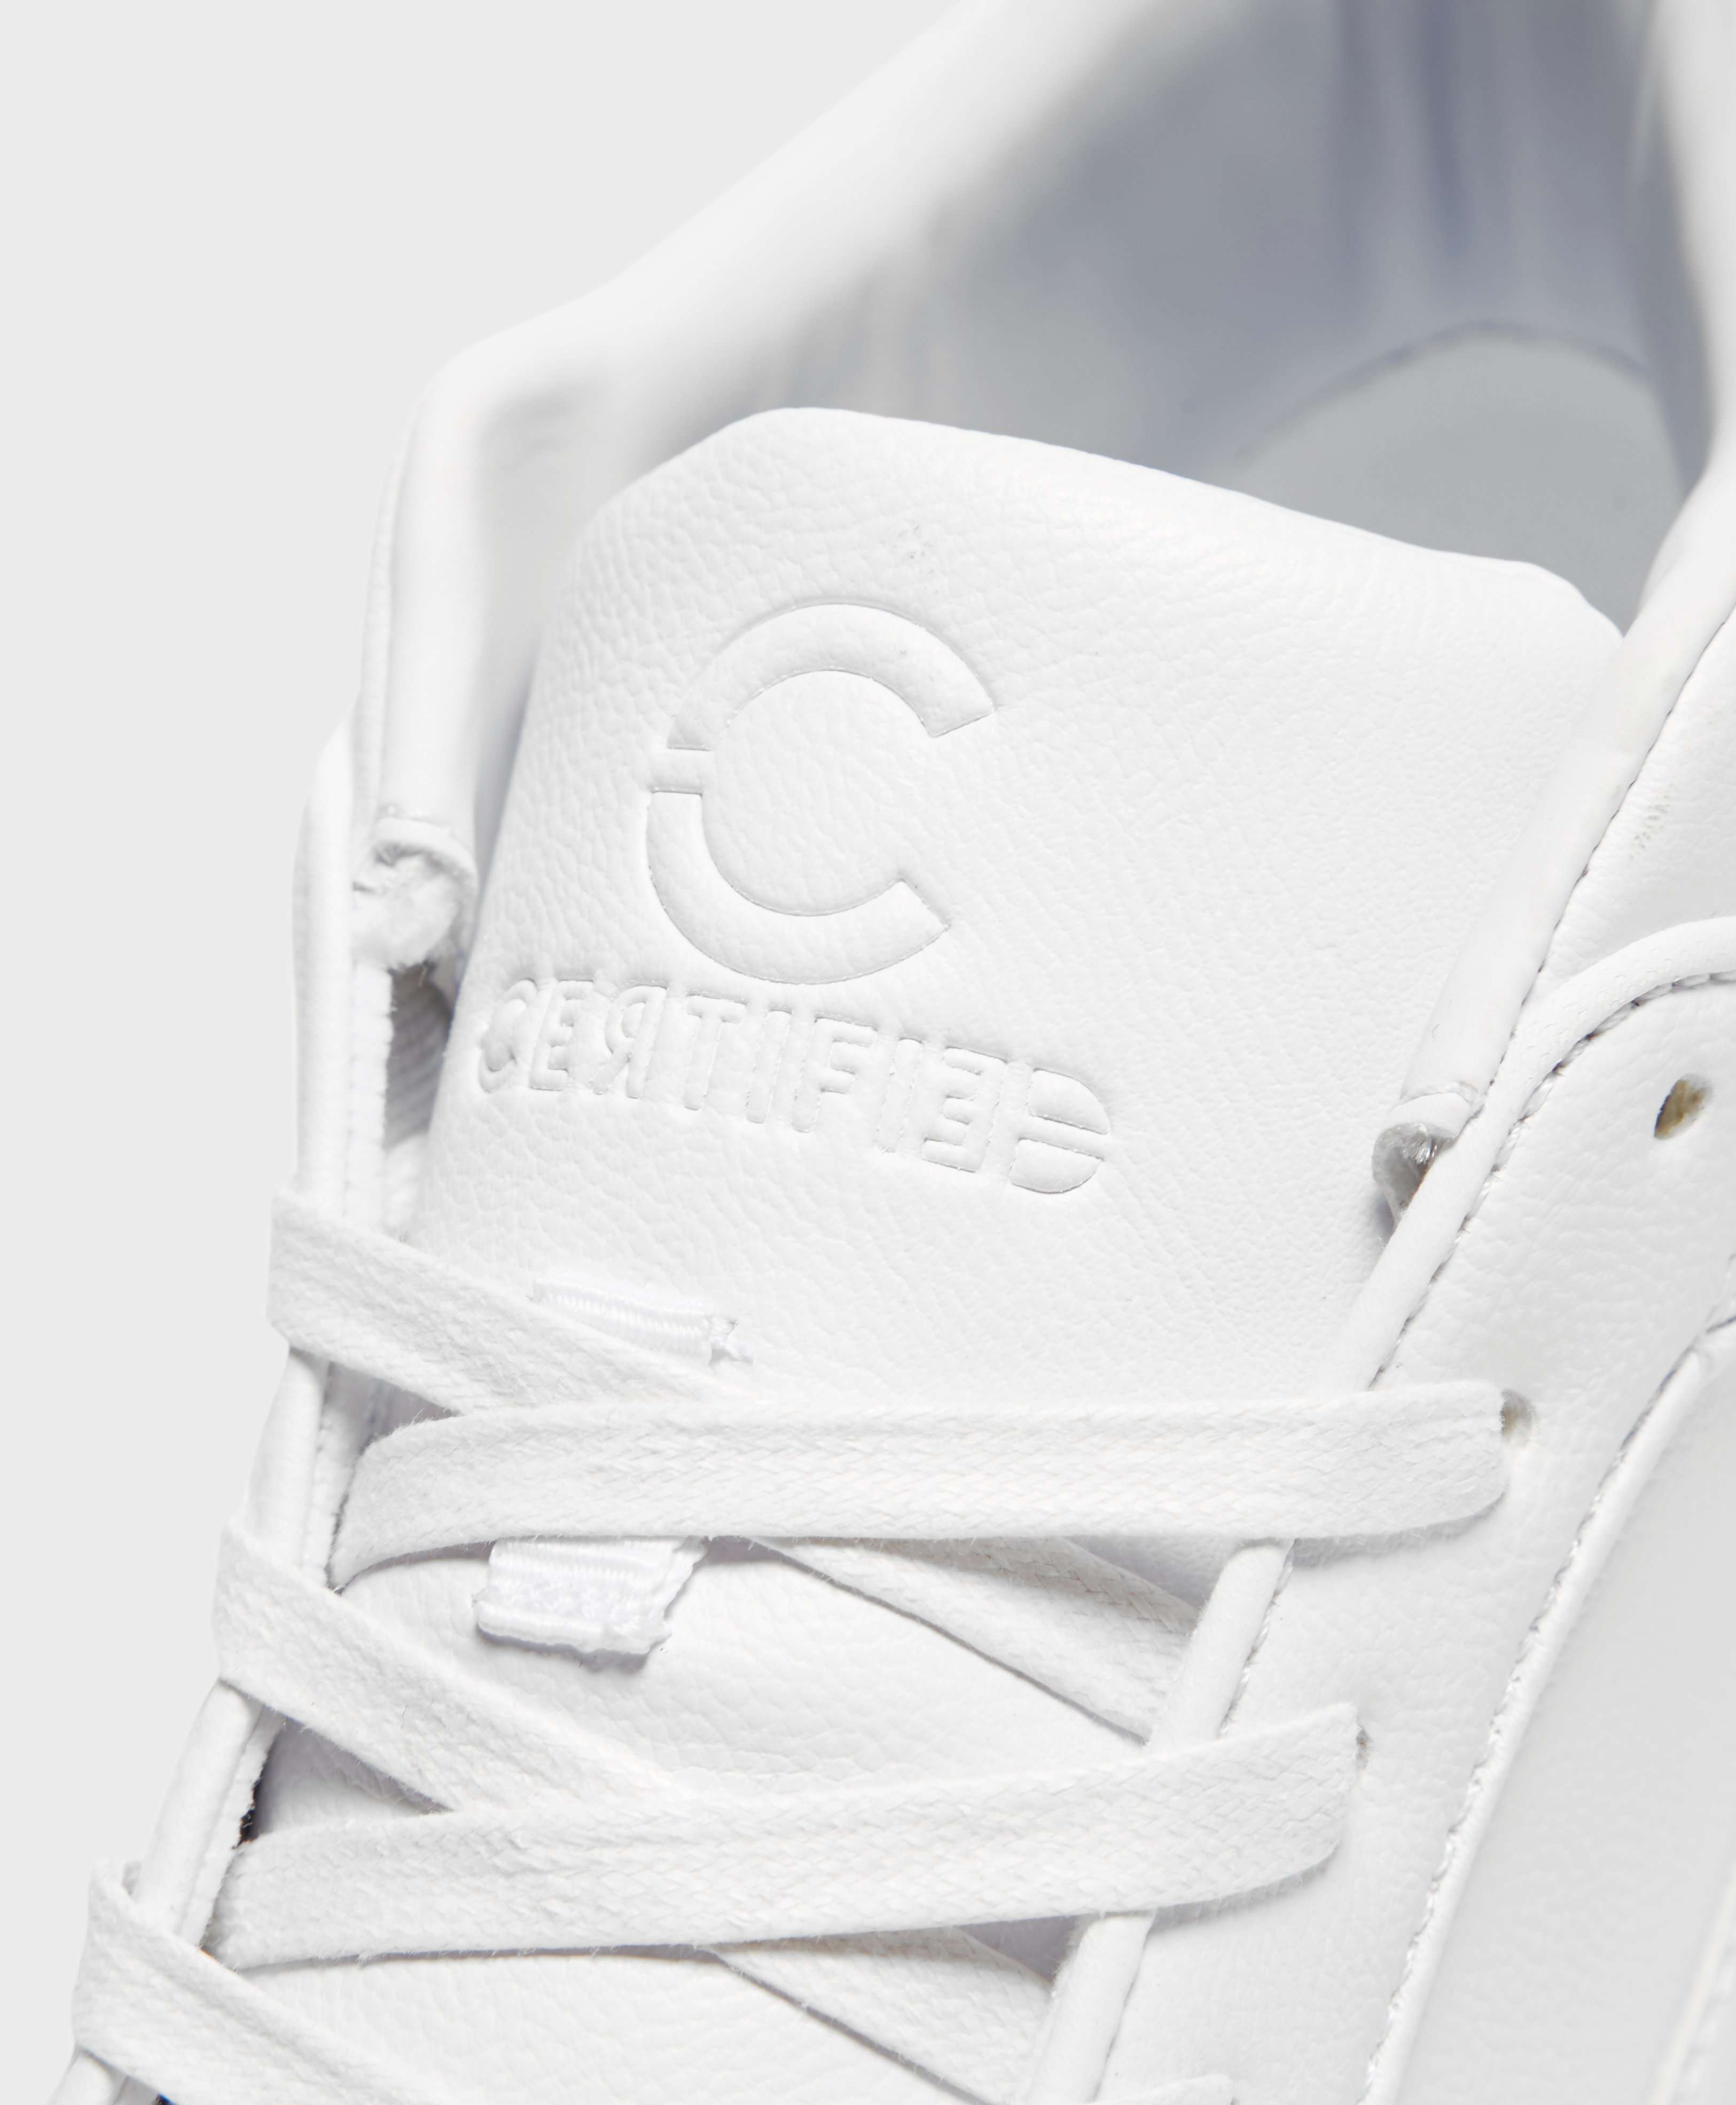 Certified London Blanco Trainers